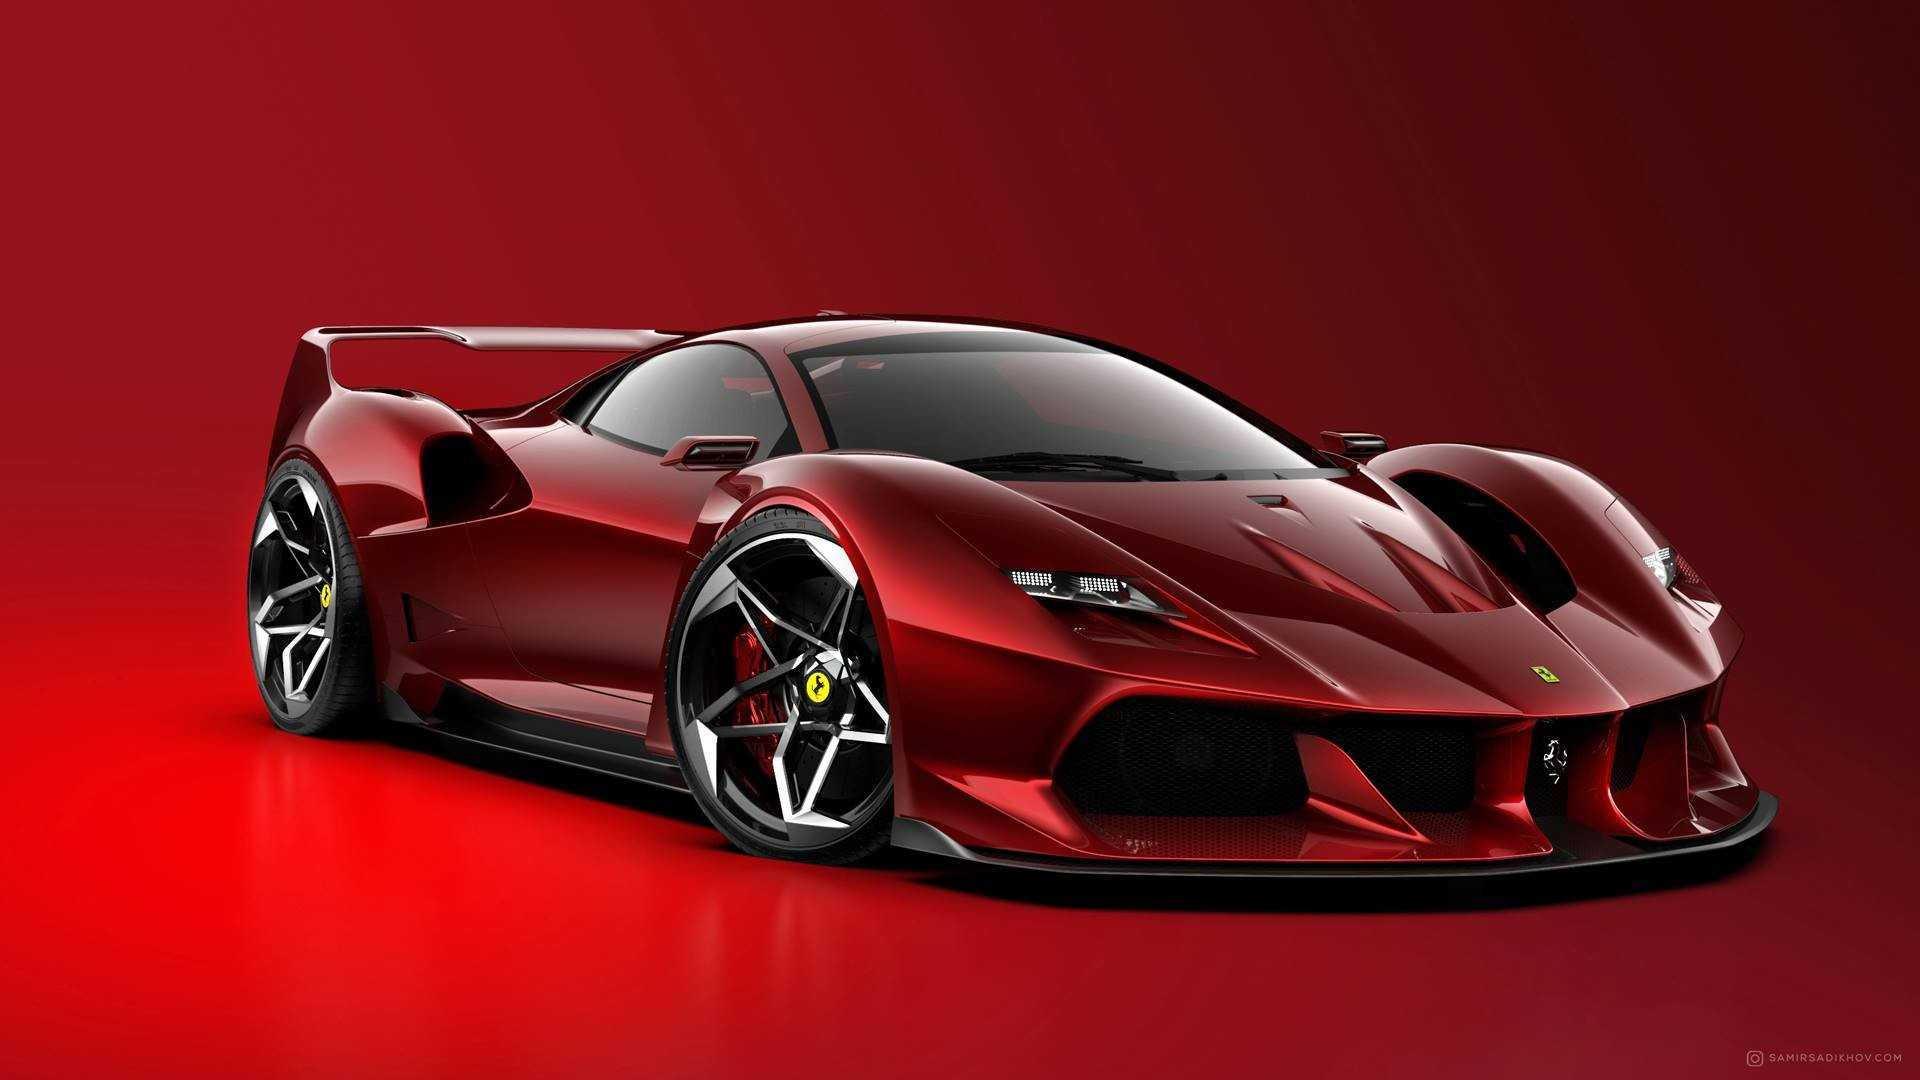 Designer Samir Sadikhov envisions a modern Ferrari F40